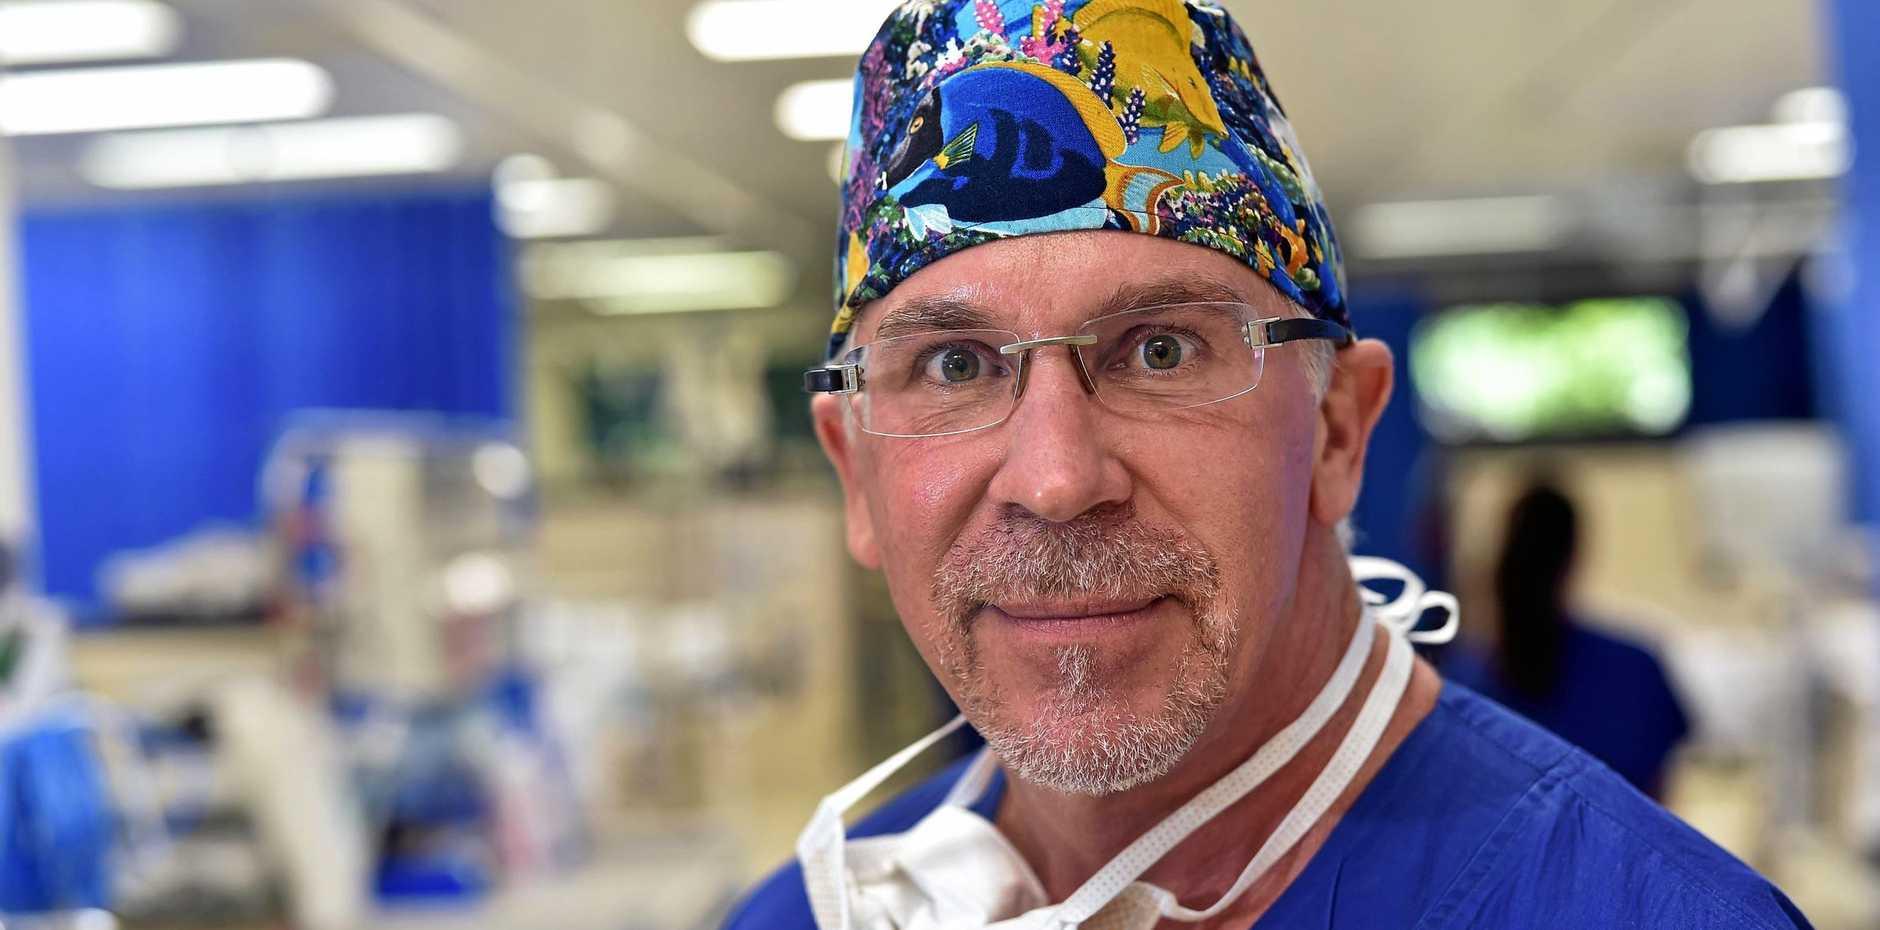 Dr Mark McGovern at Buderim Private Hospital.